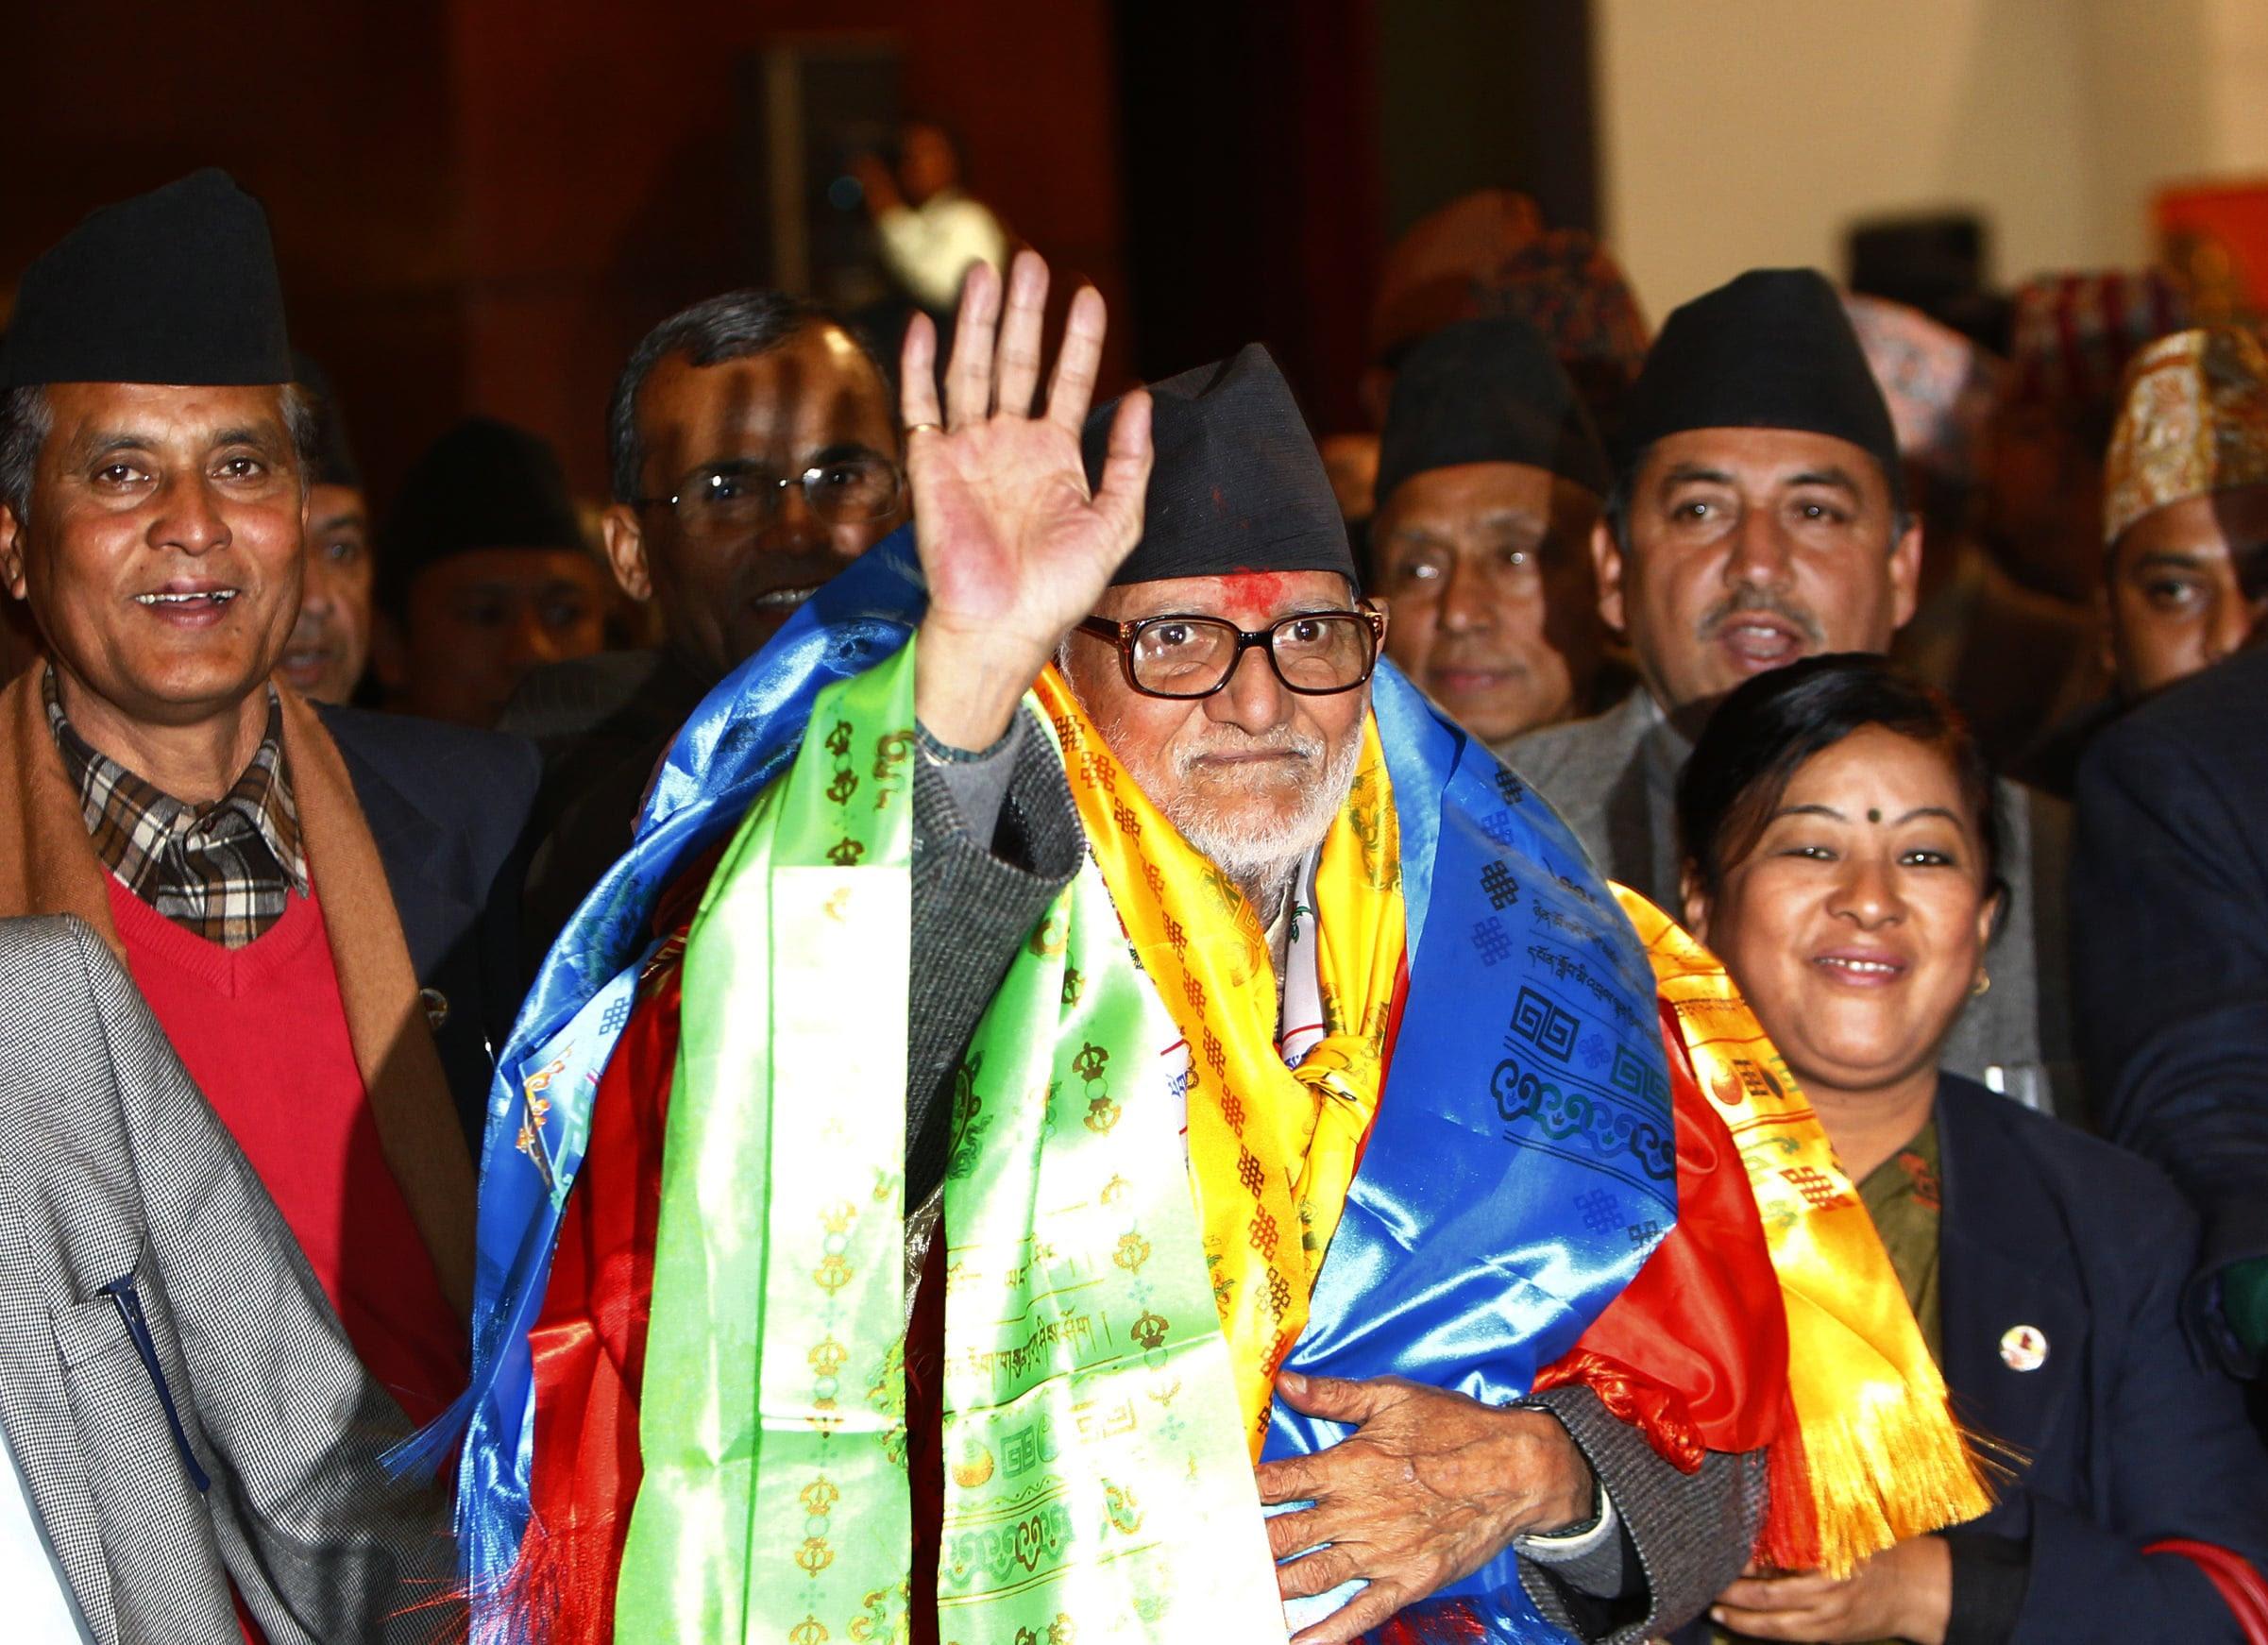 Nepal's newly elected Prime Minister Sushil Koirala waves to the media at the Constitution Assembly Hall, in Katmandu,  Nepal, Monday, Feb.10, 2014. (AP Photo/Niranjan Shrestha)